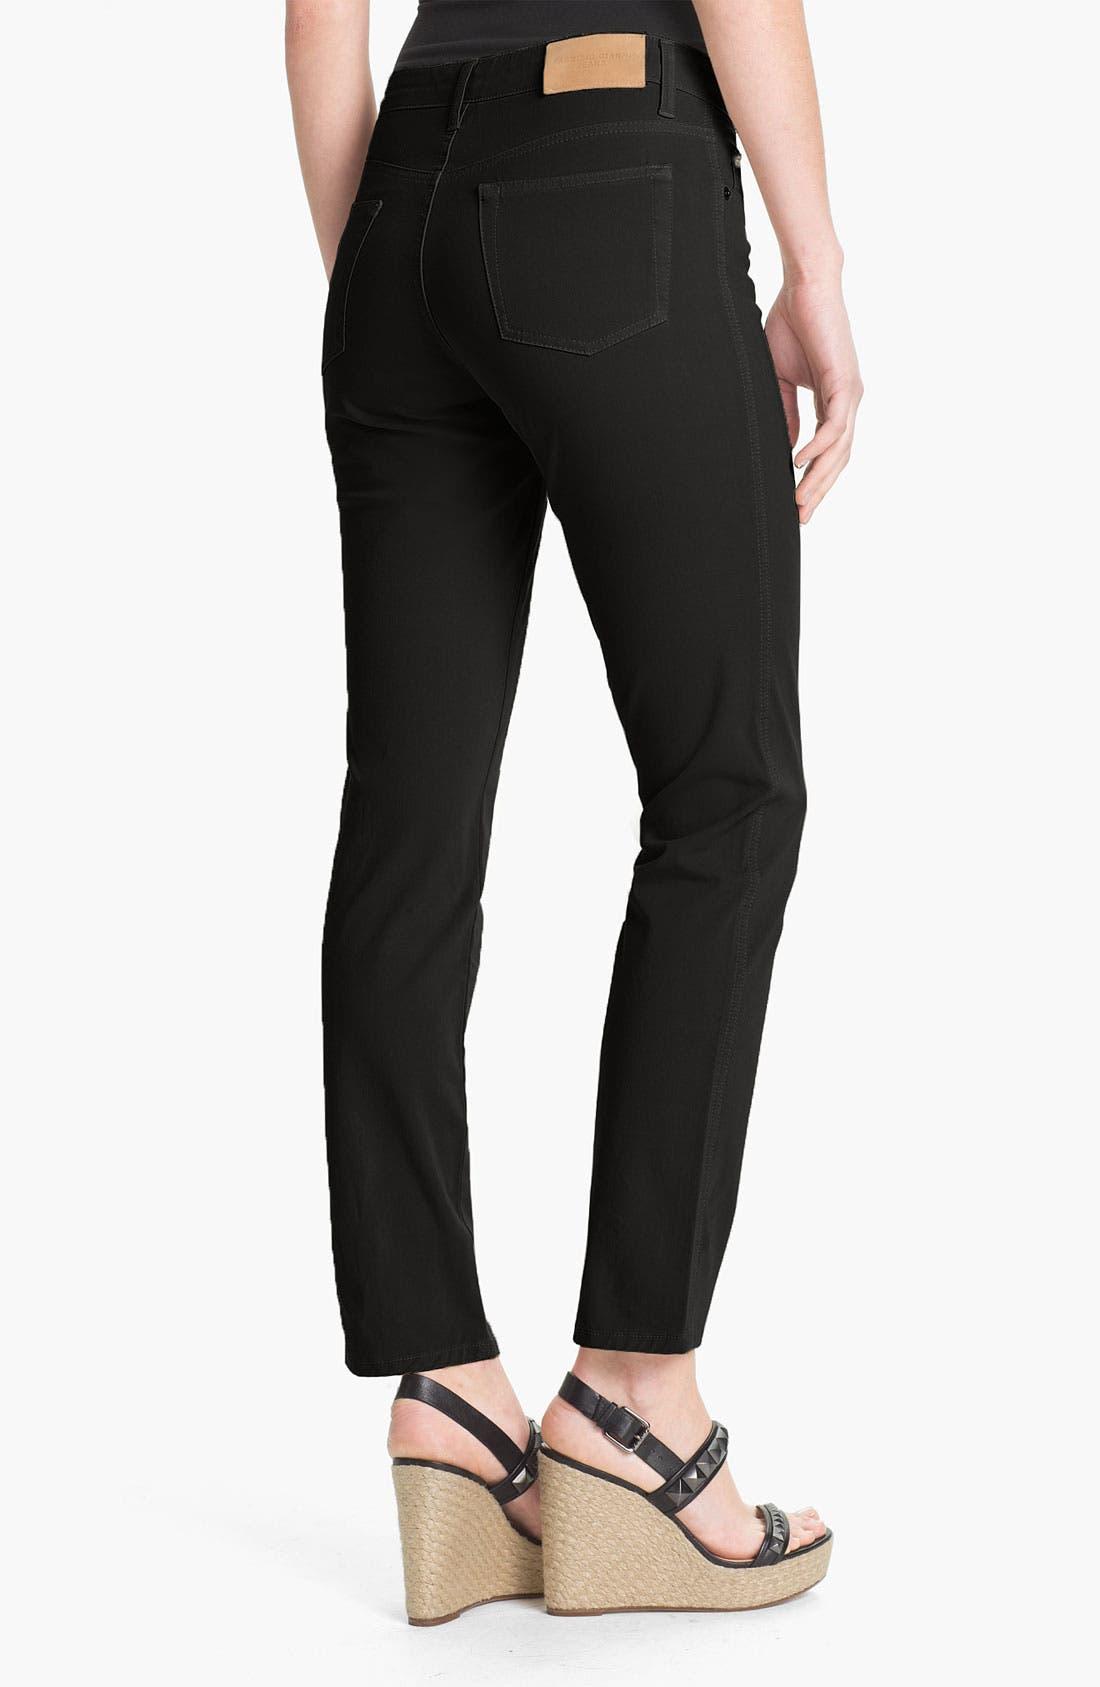 FABRIZIO GIANNI,                             5-Pocket Slim Stretch Jeans,                             Alternate thumbnail 2, color,                             001